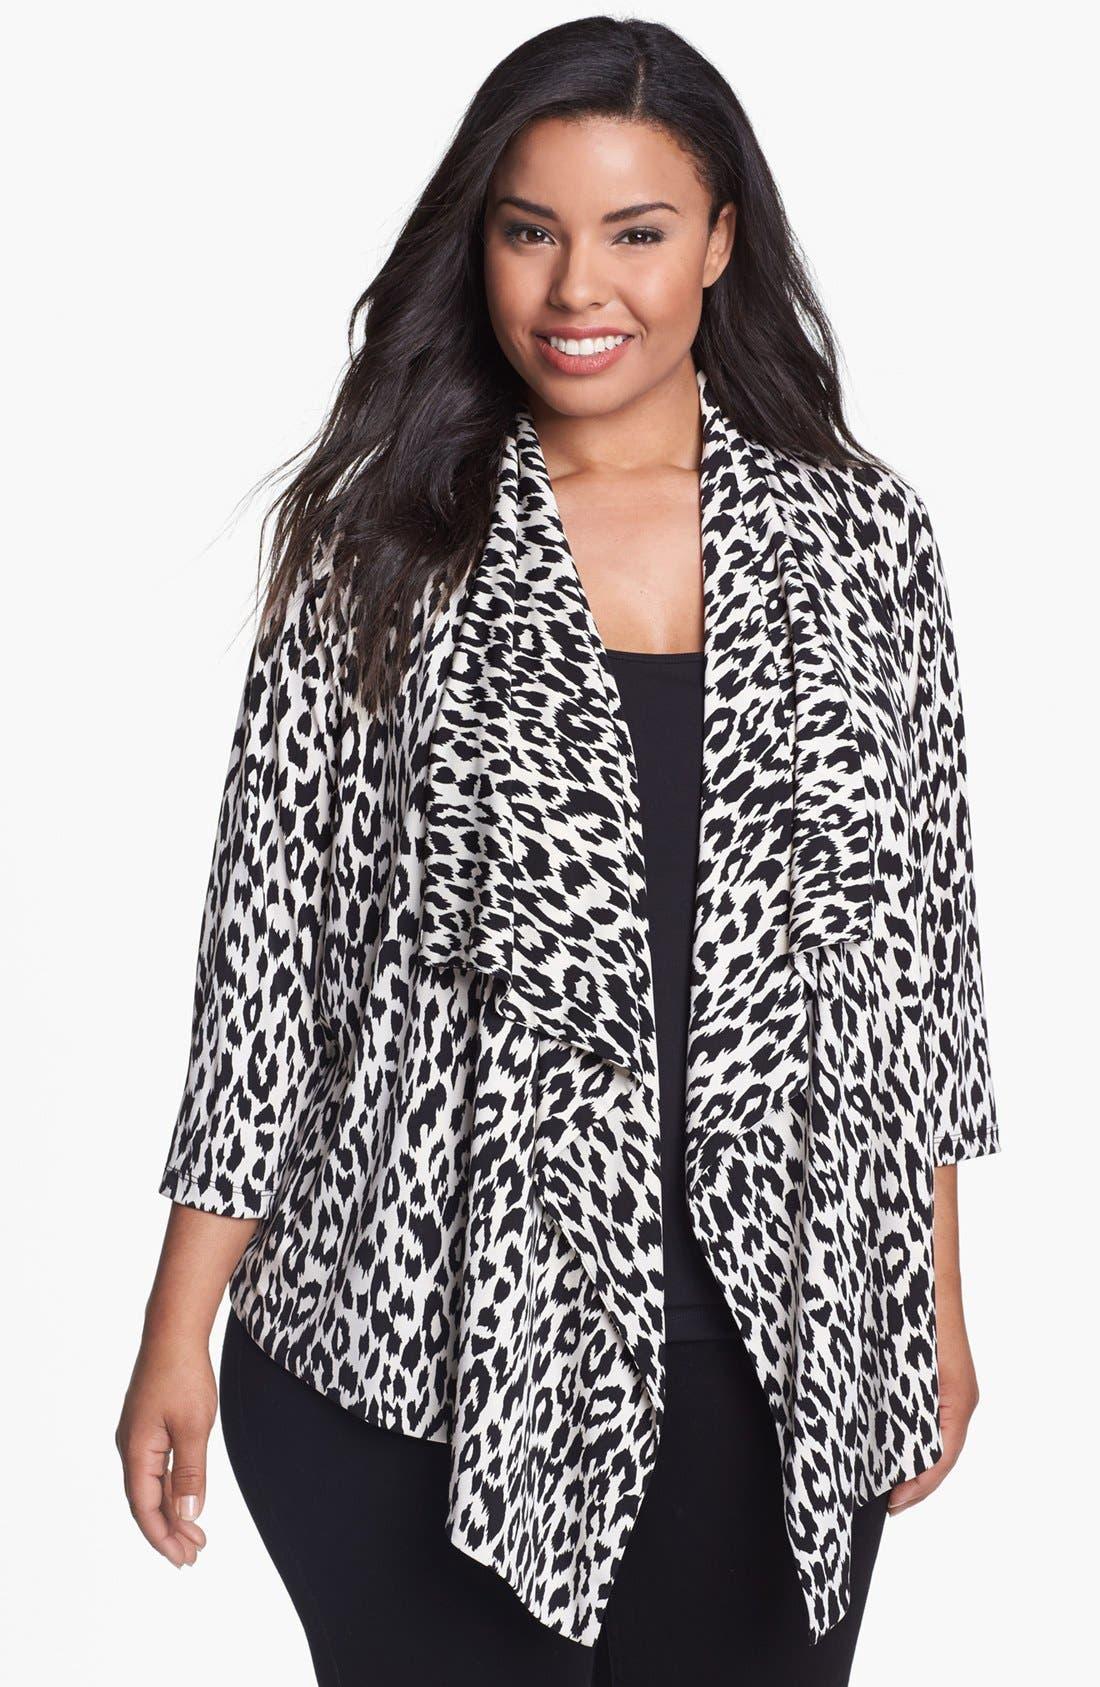 Alternate Image 1 Selected - Karen Kane Leopard Print Drape Jacket (Plus Size)